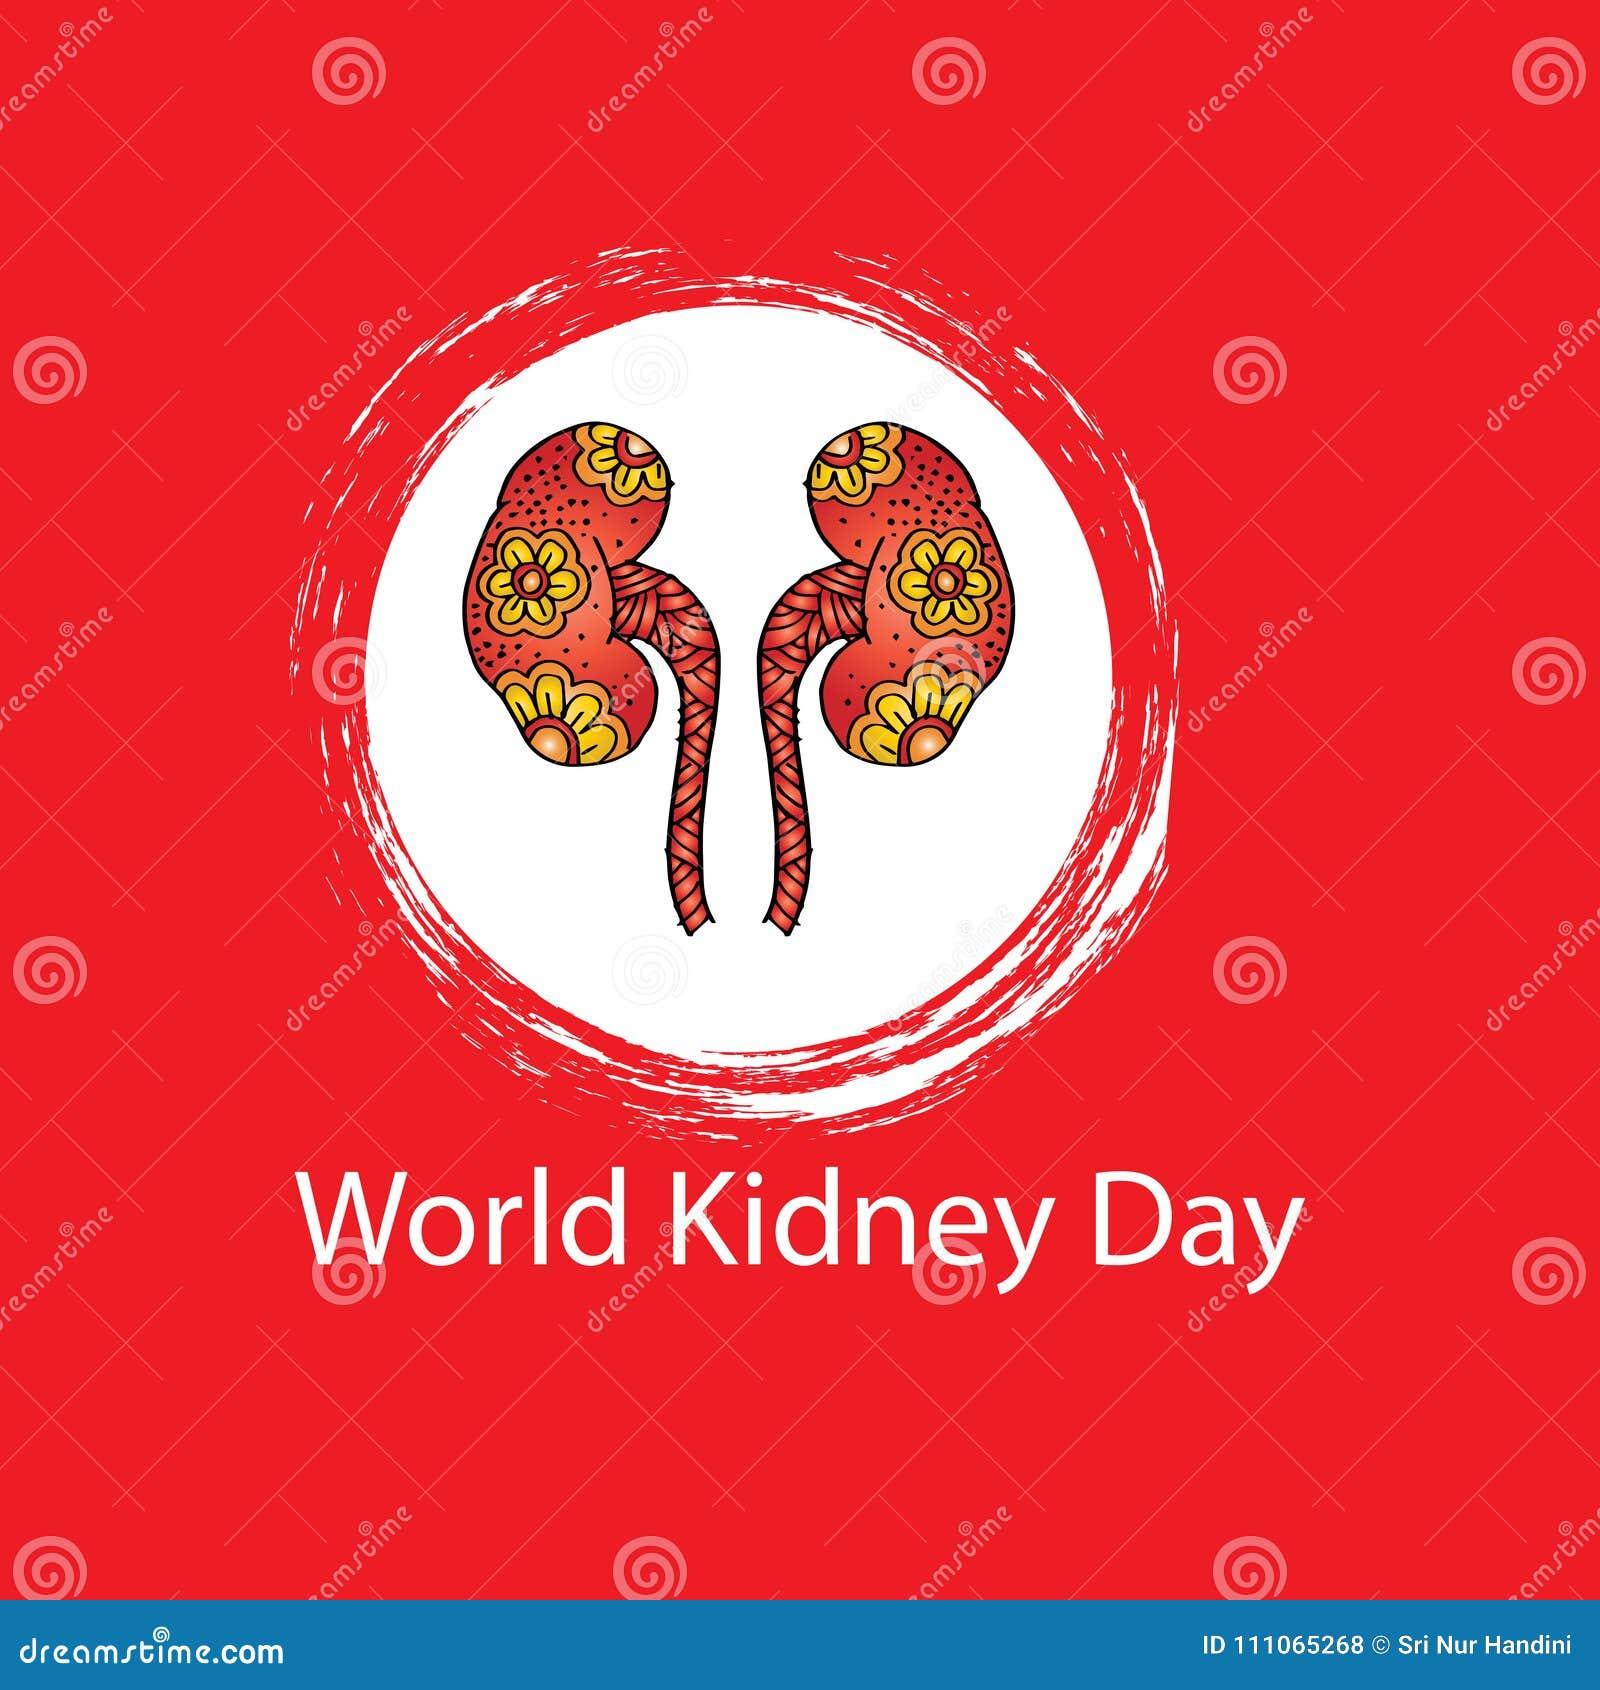 World kidney day stock illustration  Illustration of biology